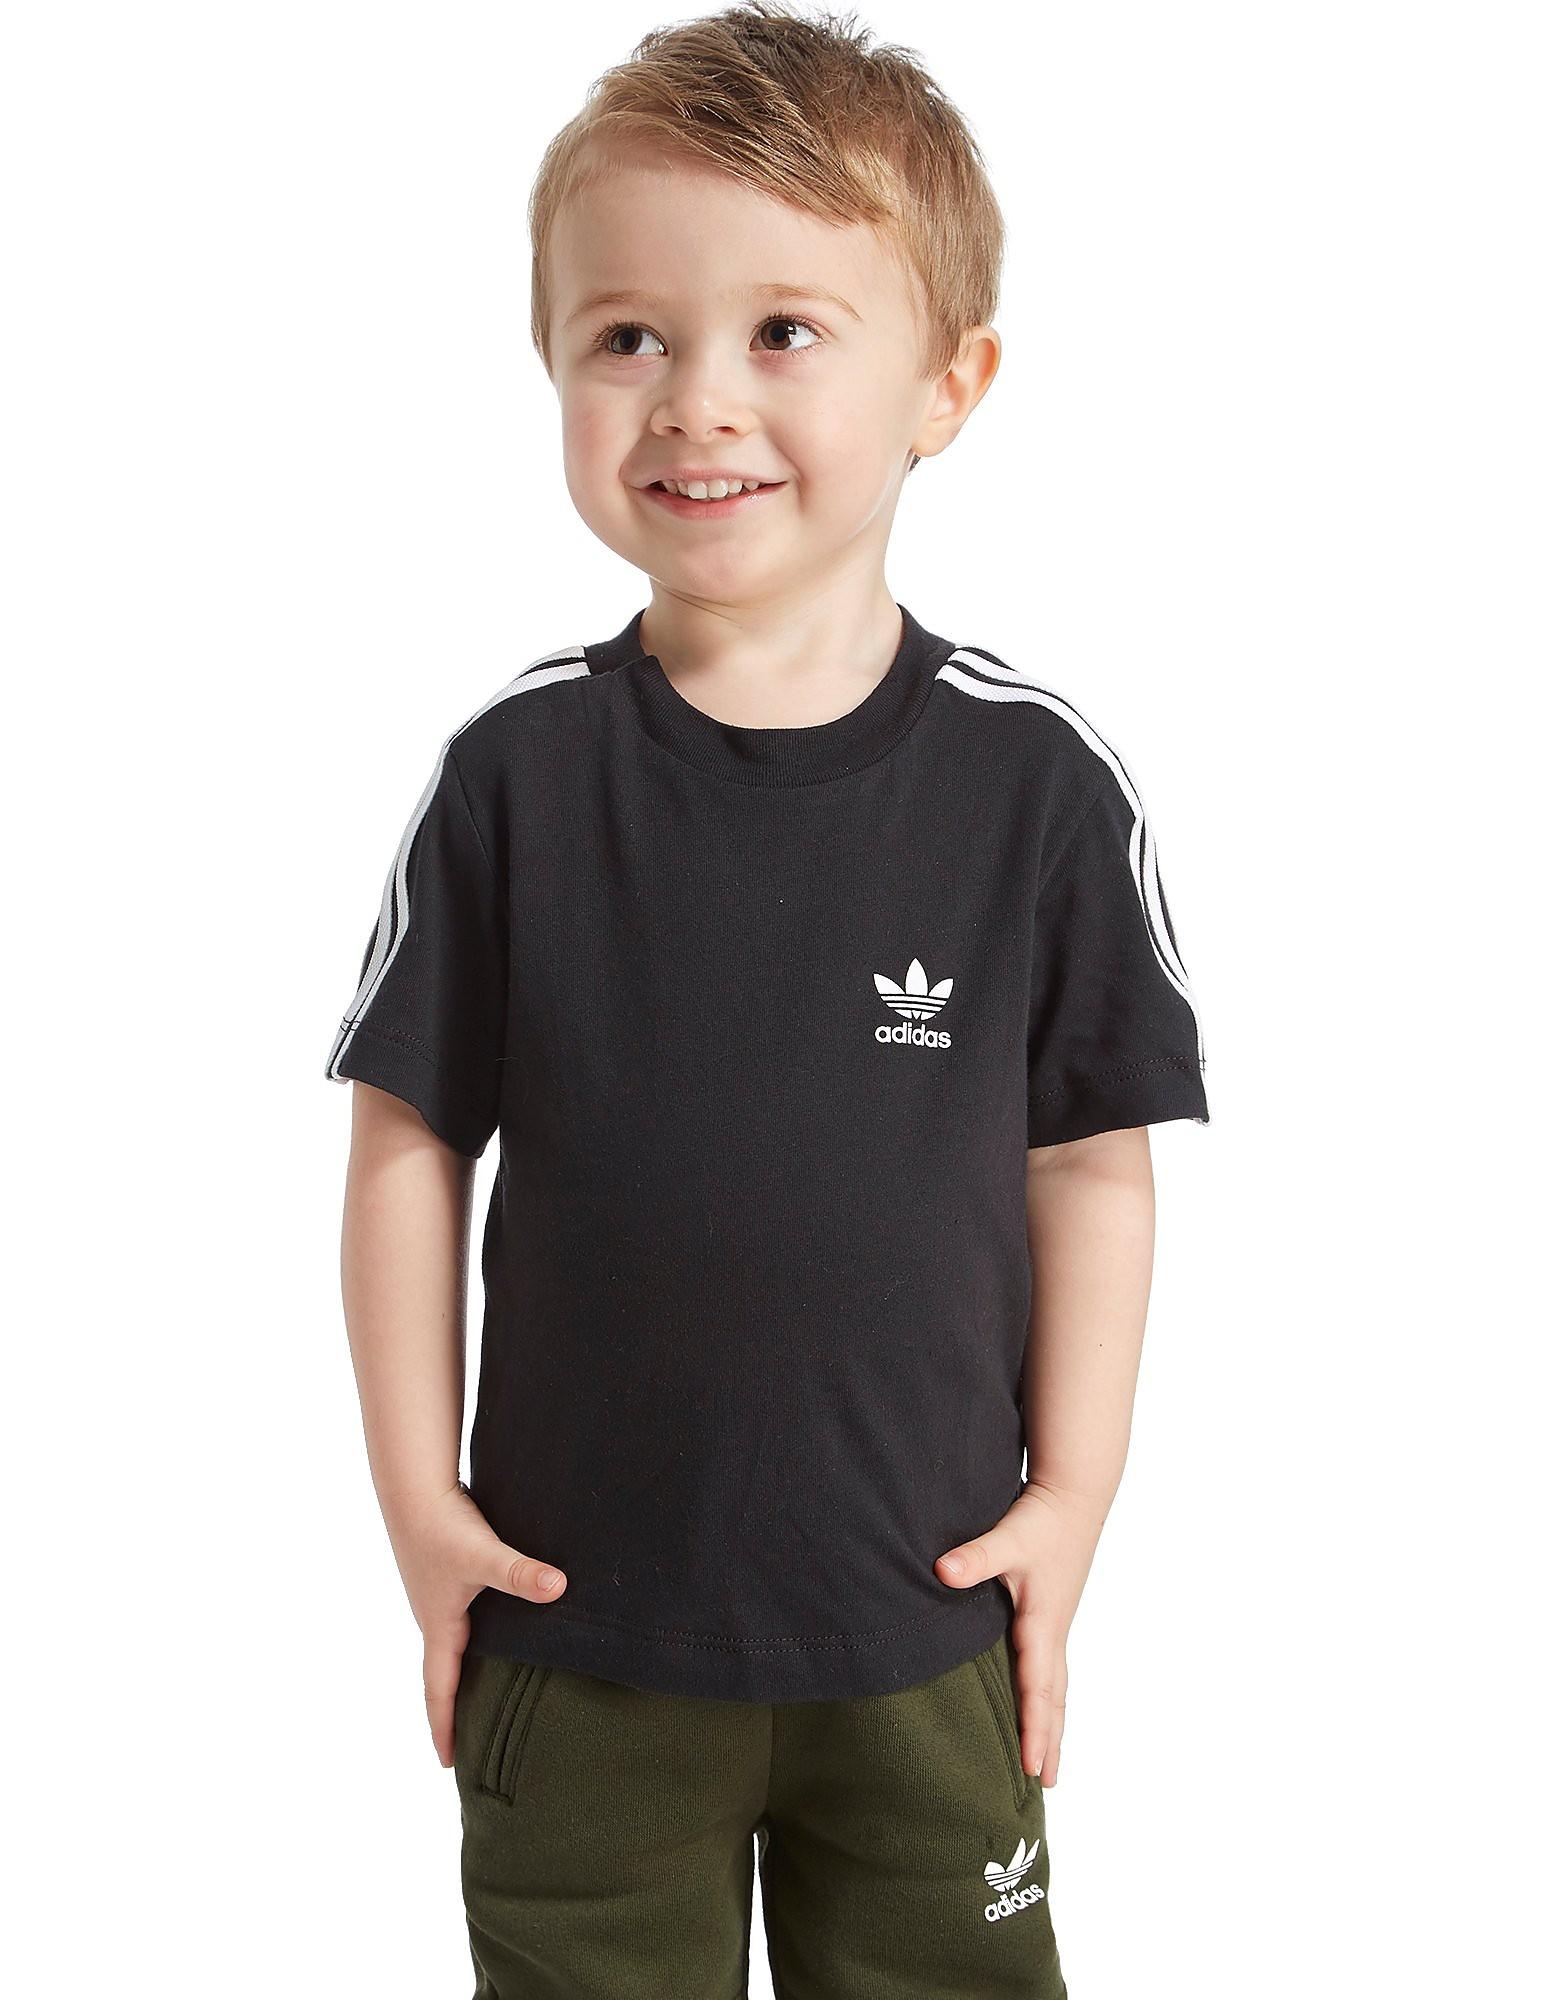 adidas Originals Trefoil T-Shirt Infant